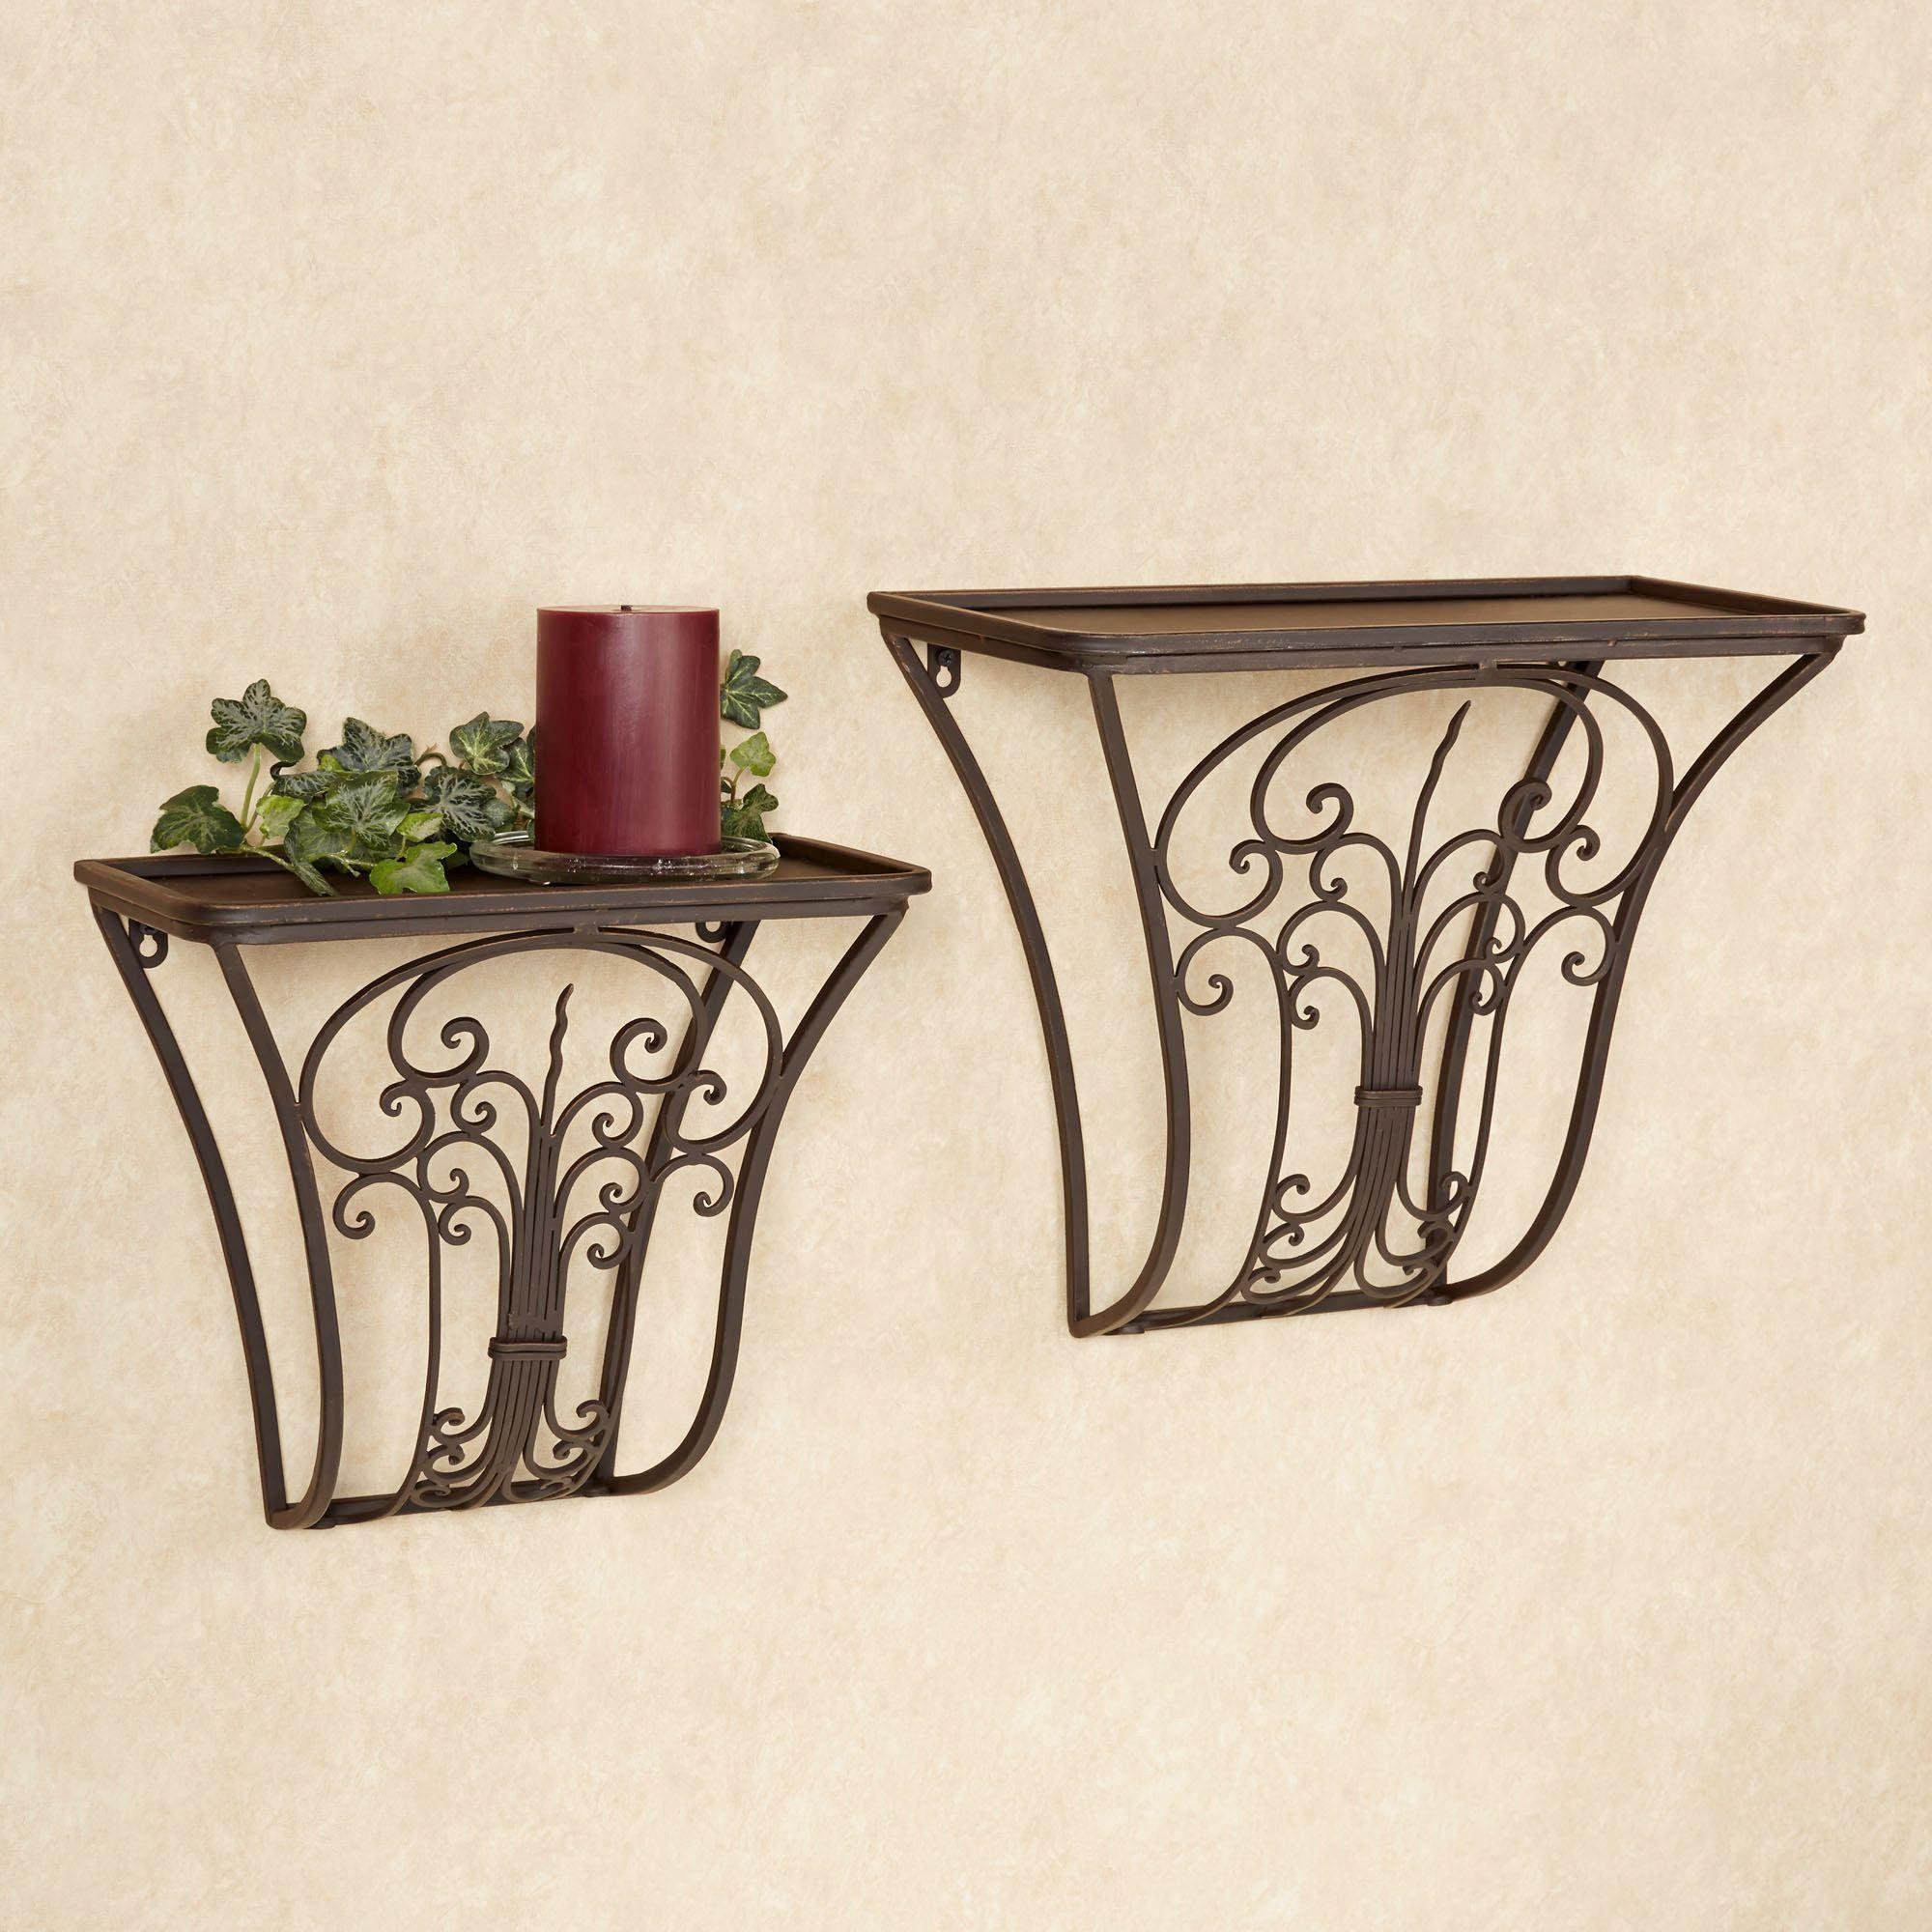 Jada wrought iron wall shelf set click to expand amipublicfo Choice Image